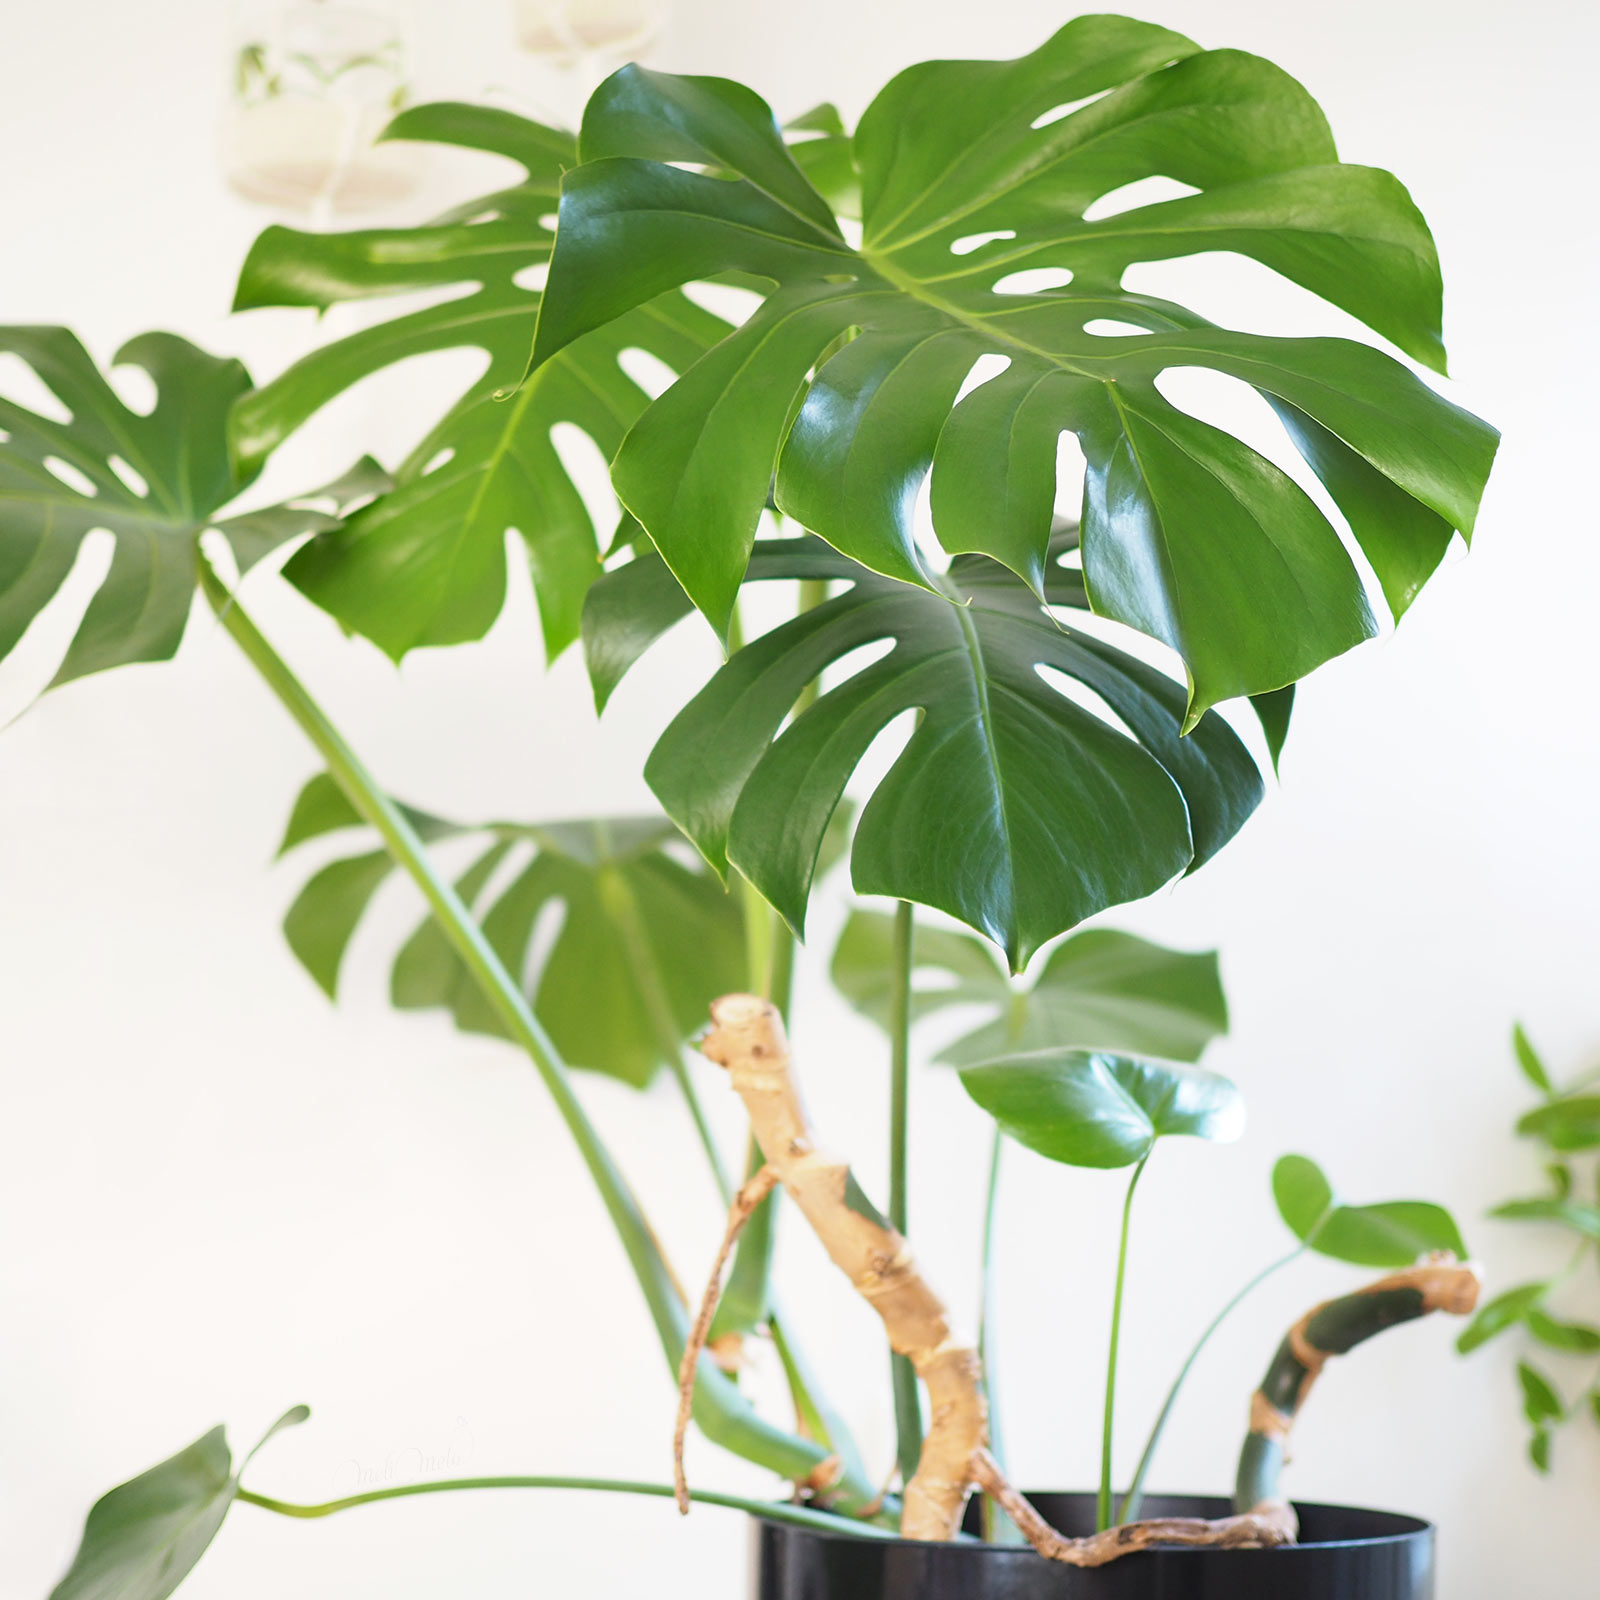 feuilles plante monstera deliciosa bouture atelier laboutiquedemelimelo